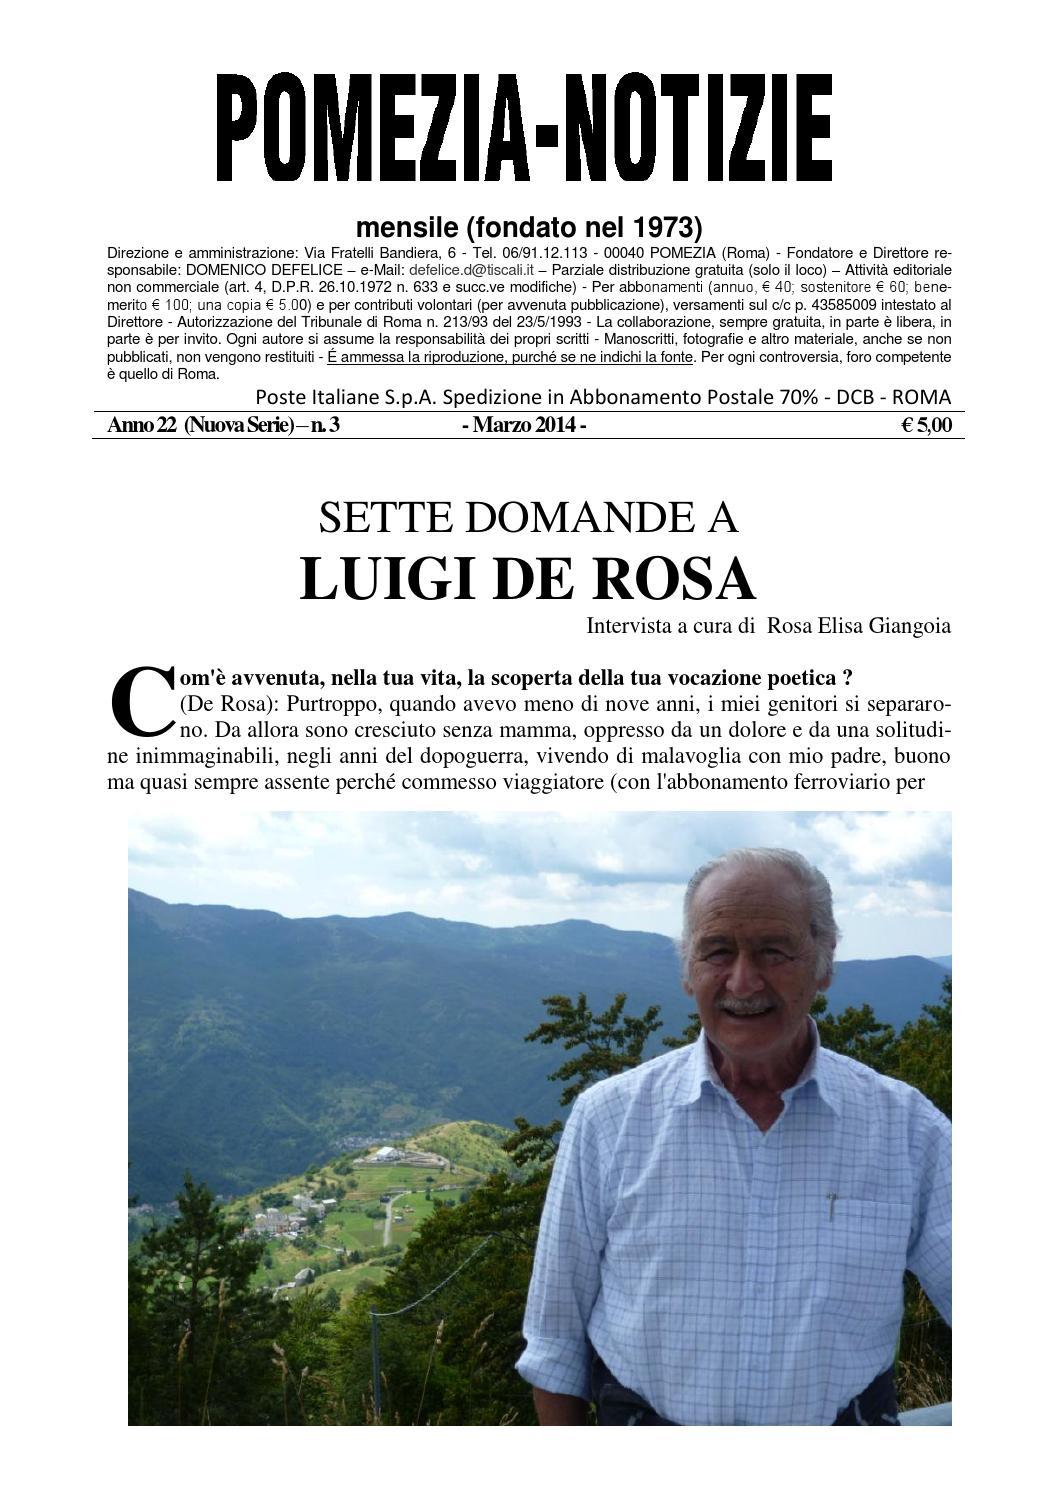 Pomezia Notizie 2014 3 by Domenico - issuu d6f67f13e78a